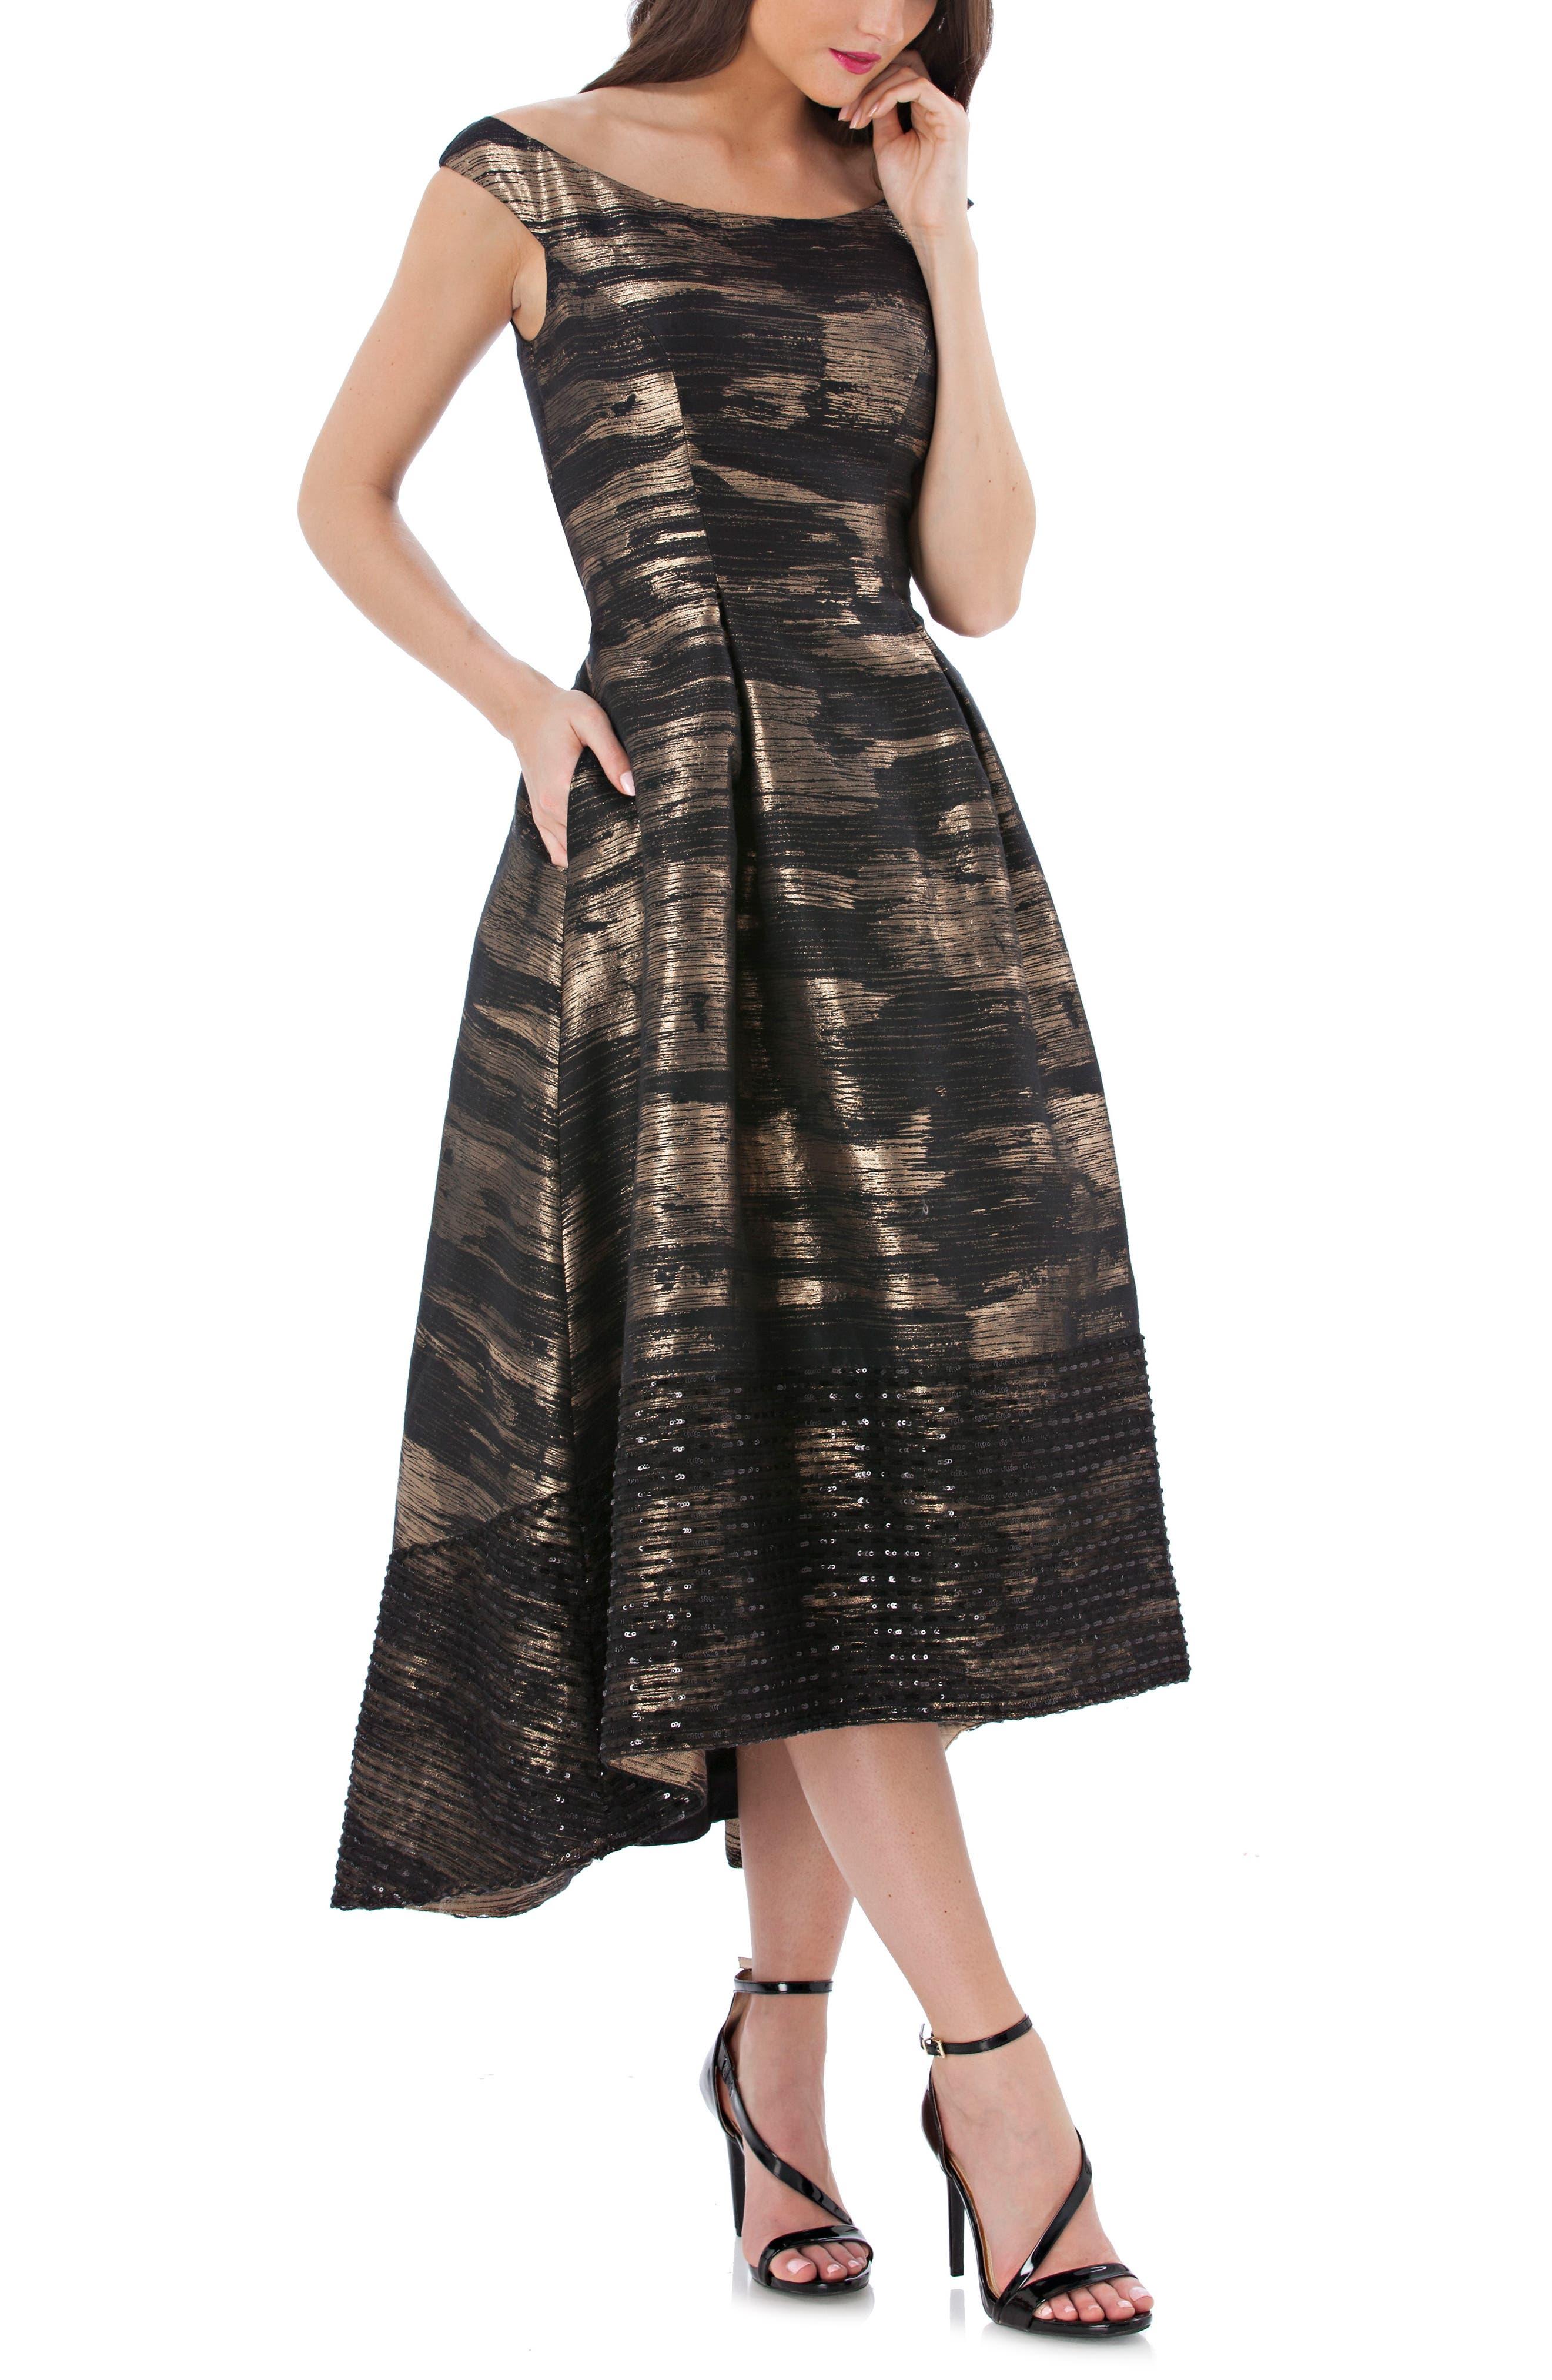 Alternate Image 1 Selected - Carmen Marc Valvo Infusion Brocade Off the Shoulder Dress